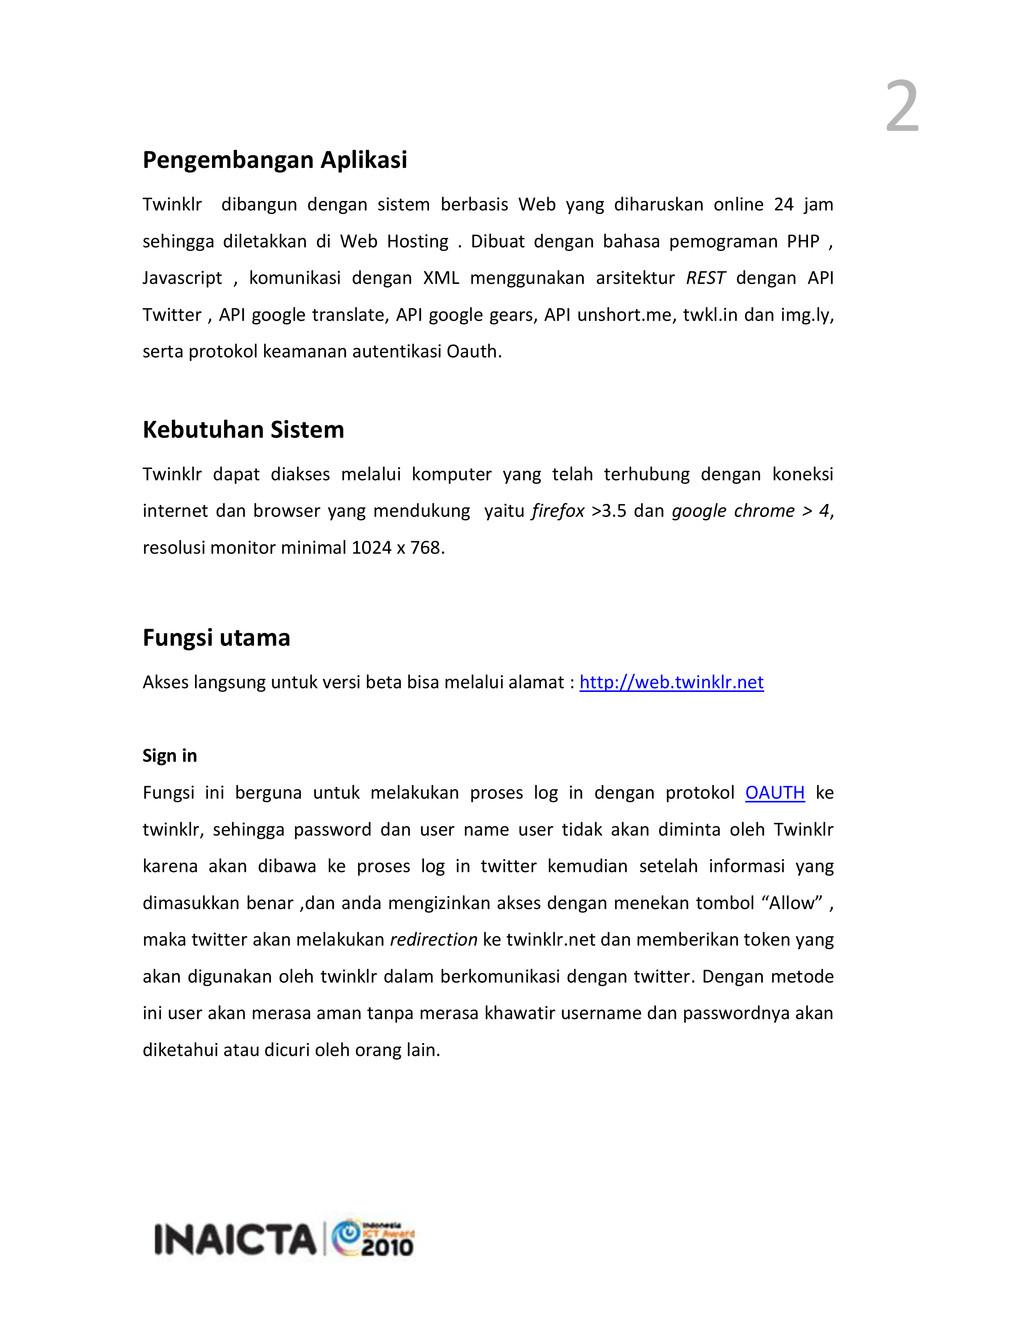 2 Pengembangan Aplikasi Twinklr dibangun dengan...